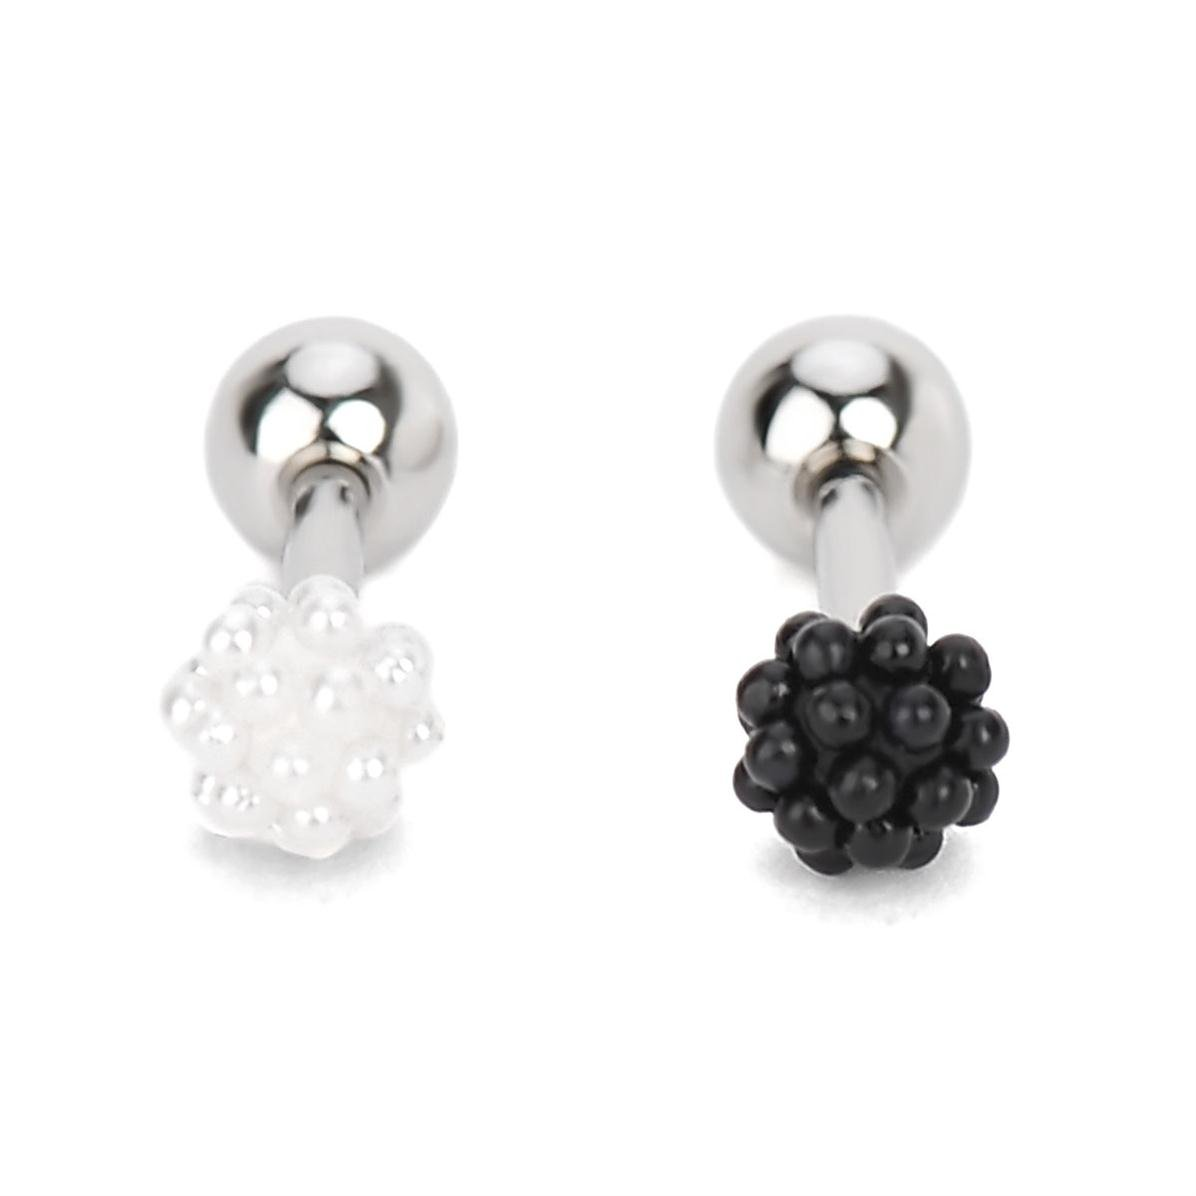 2 Pairs Stainless Steel Stud Earrings Barbell Black White Body Piercing Set